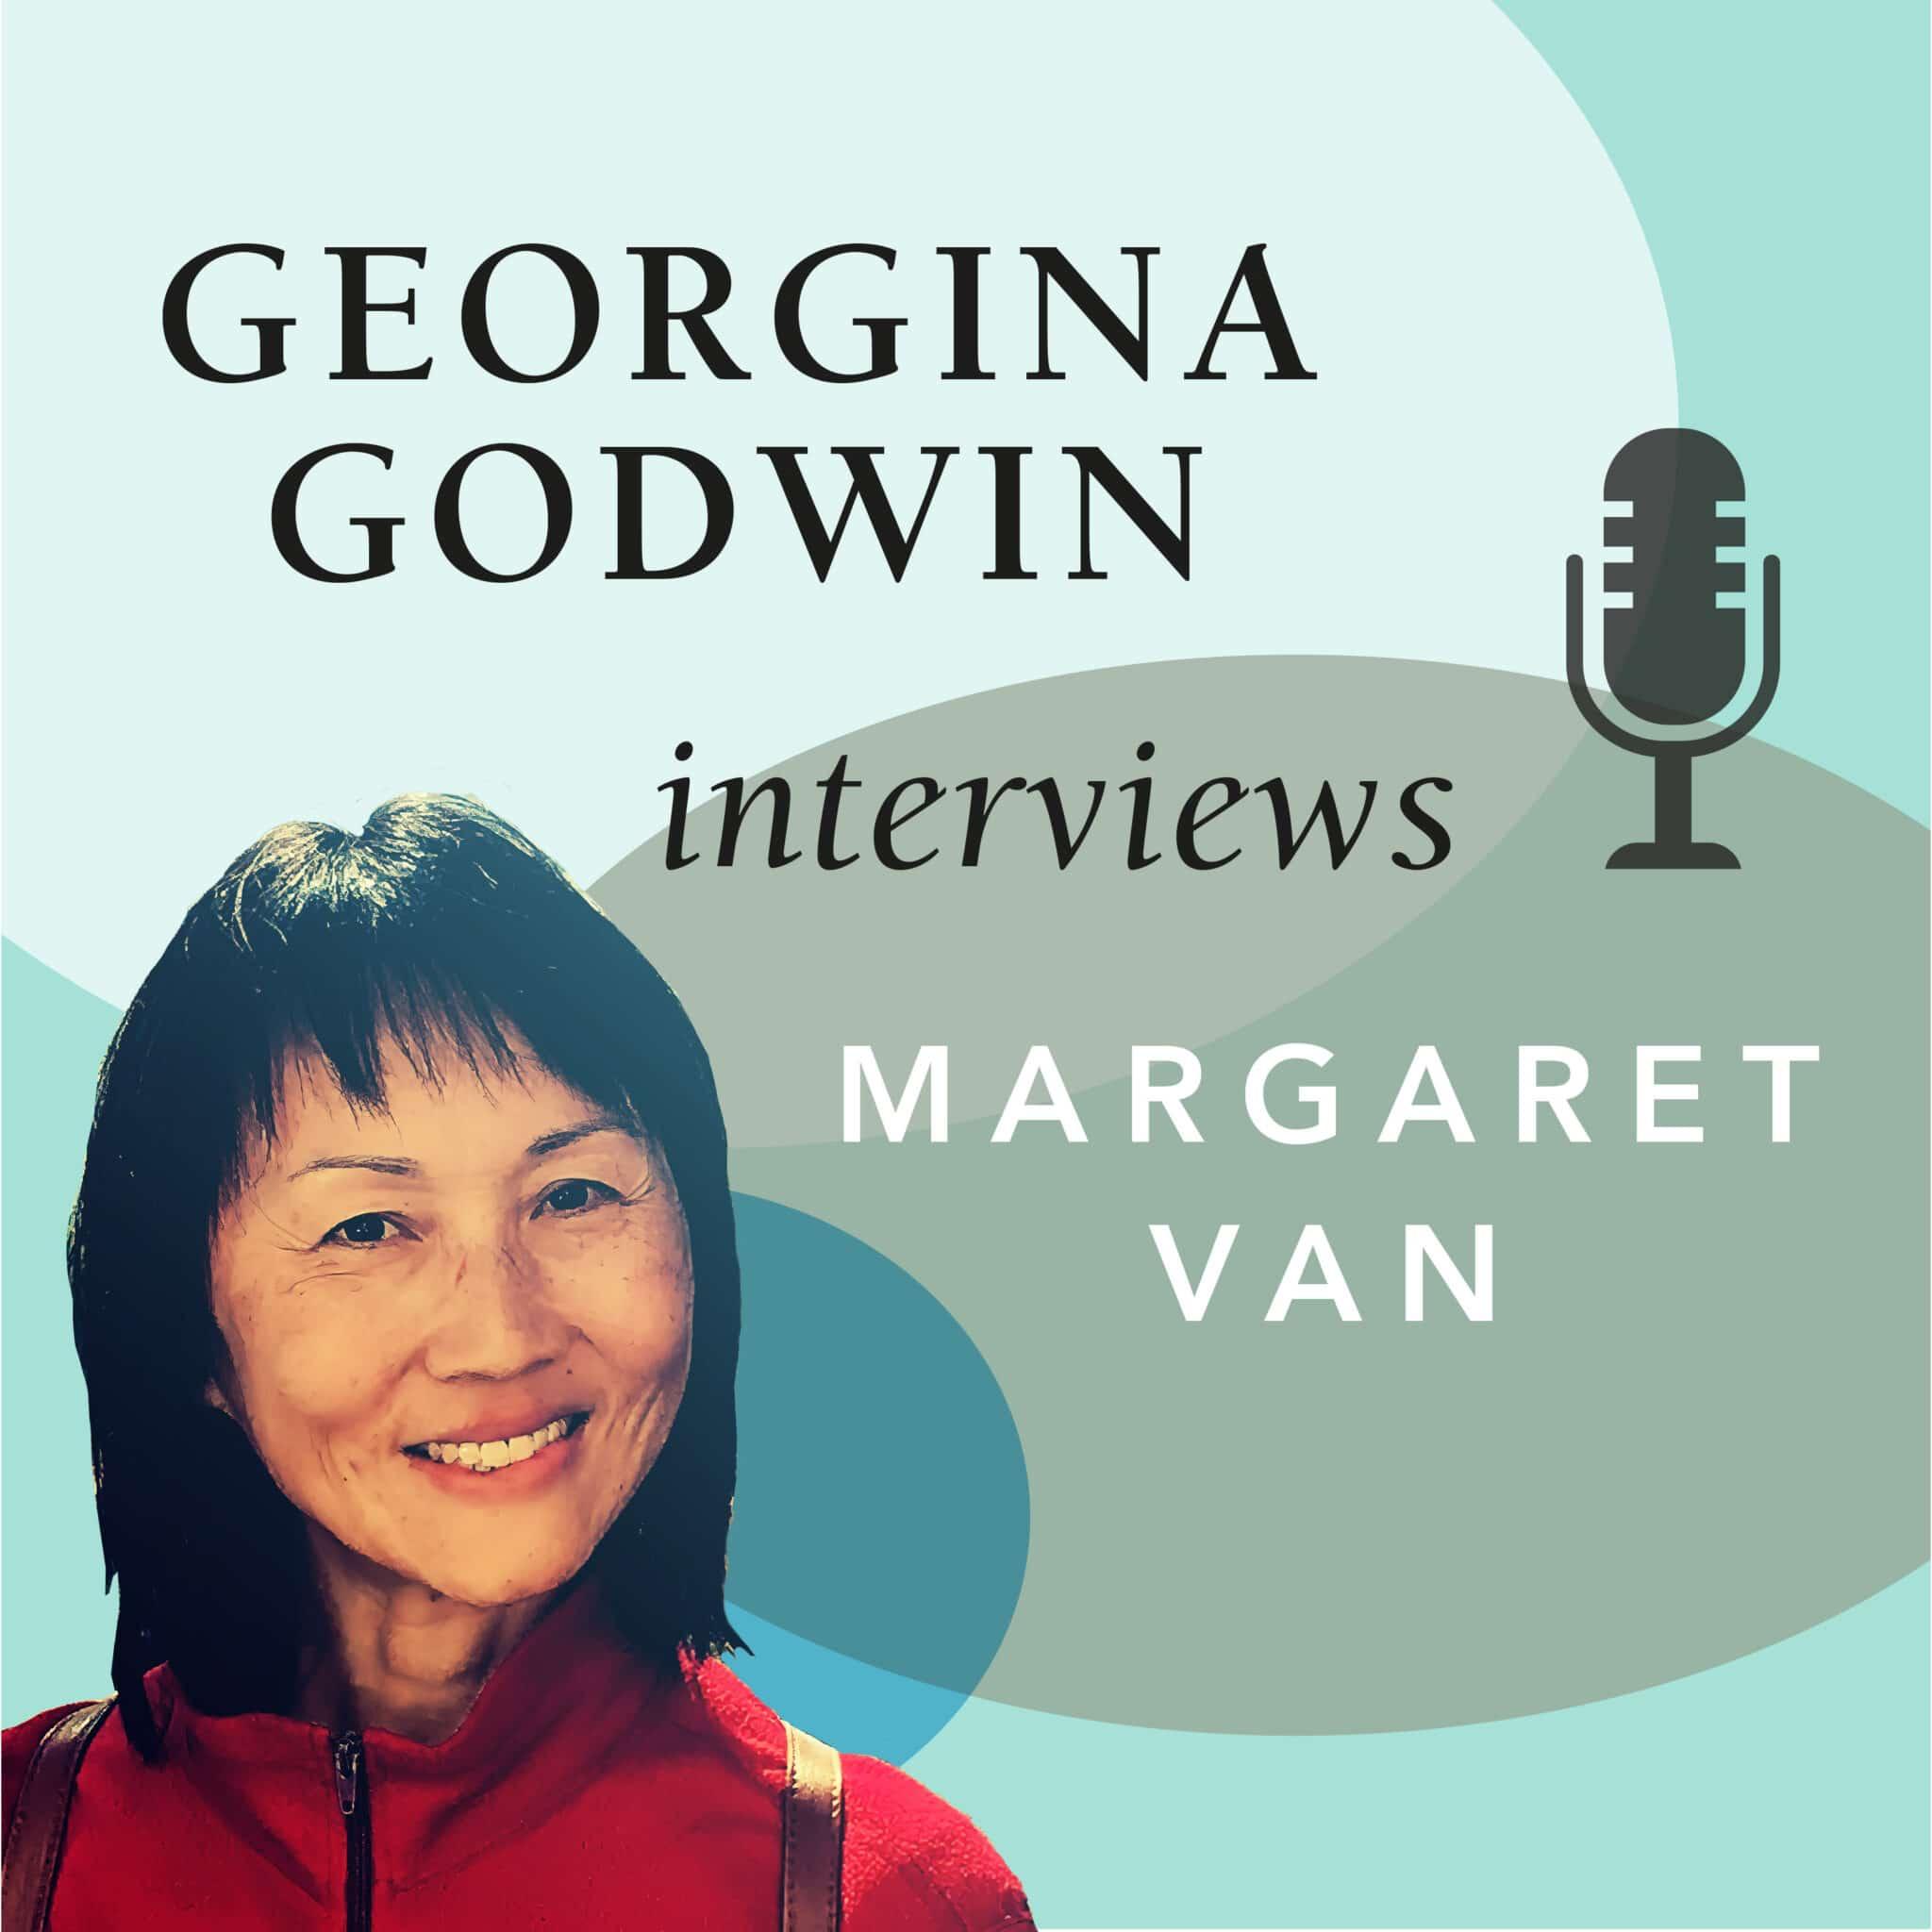 Georgina Godwin interviews Margaret Van